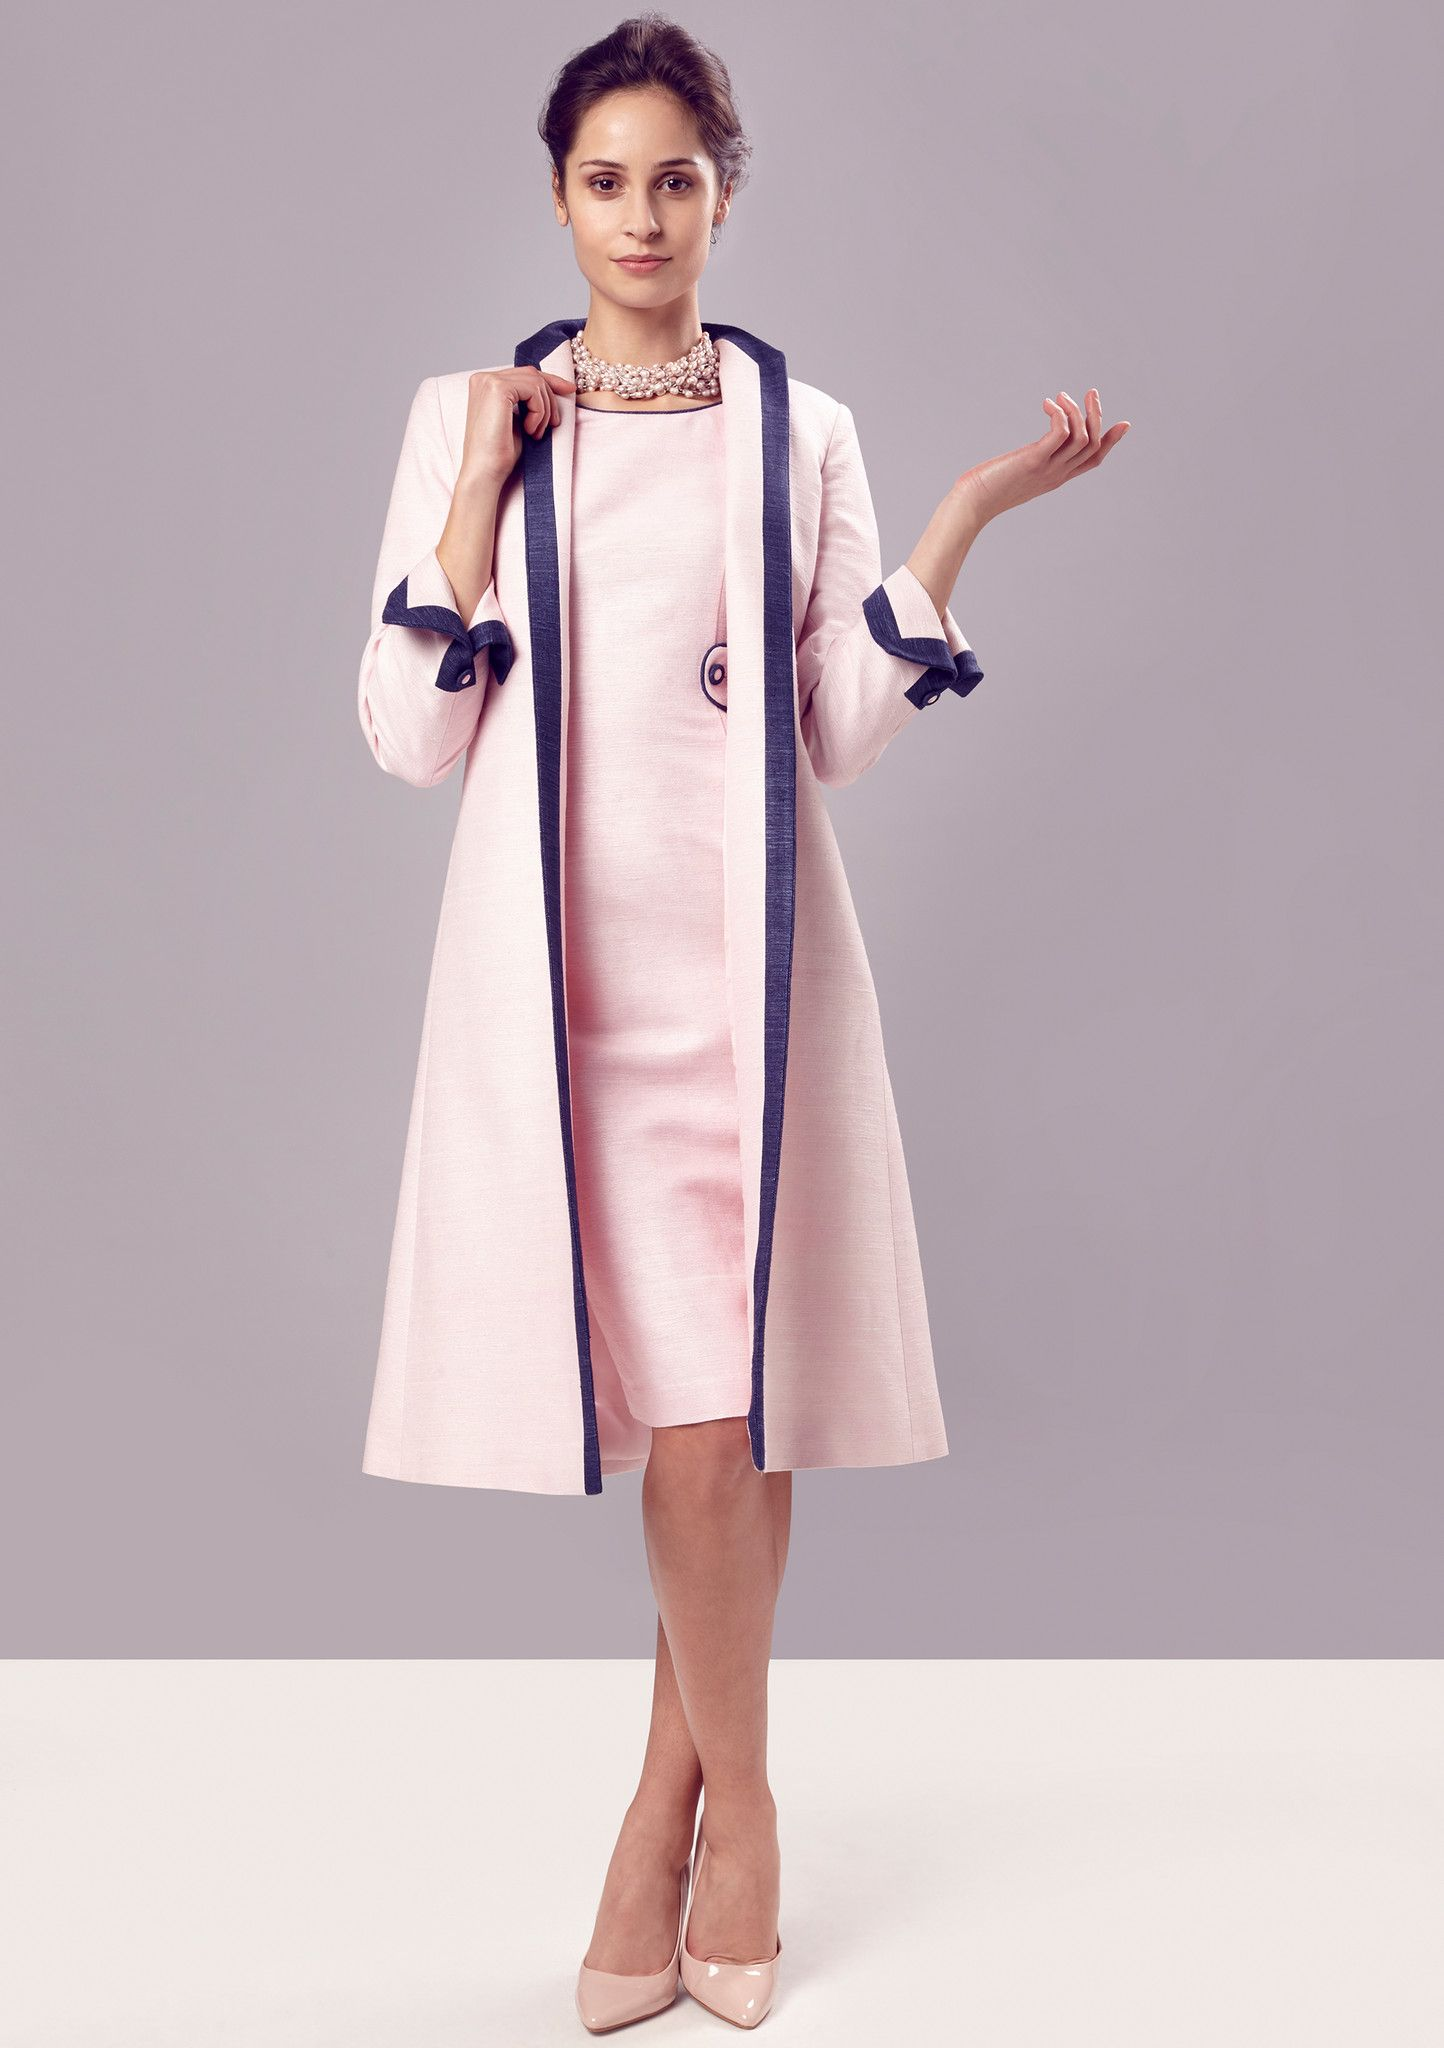 Dress Coat In Petal Pinknavy Raw Silk Tussah Lorna